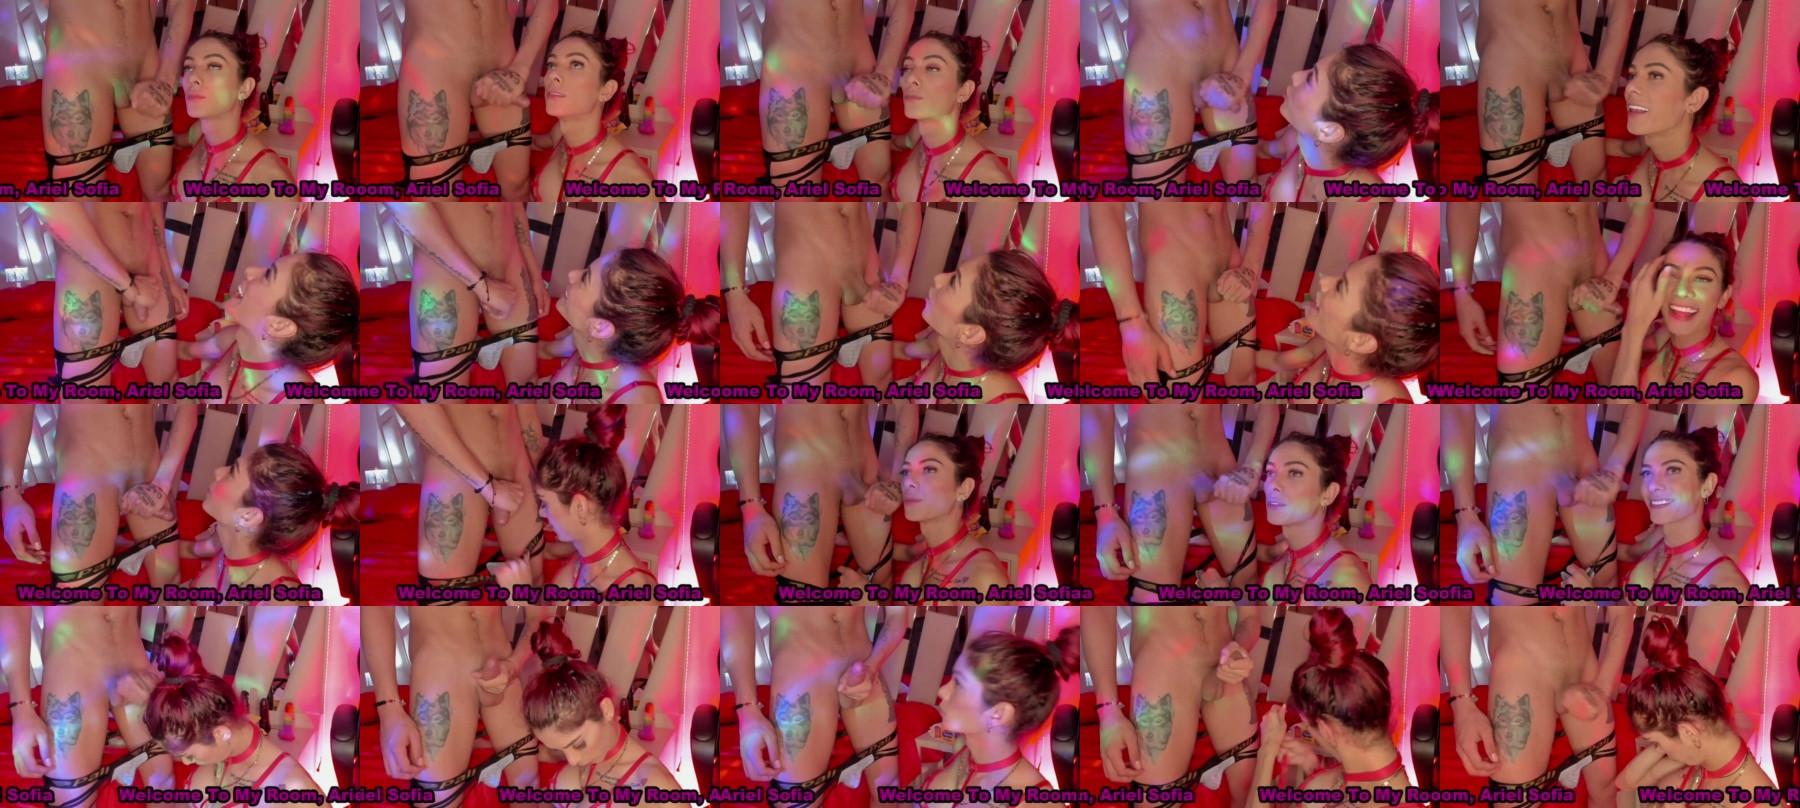 Sado_Soffy_Couple ts 17-04-2021 Chaturbate trans Webcam